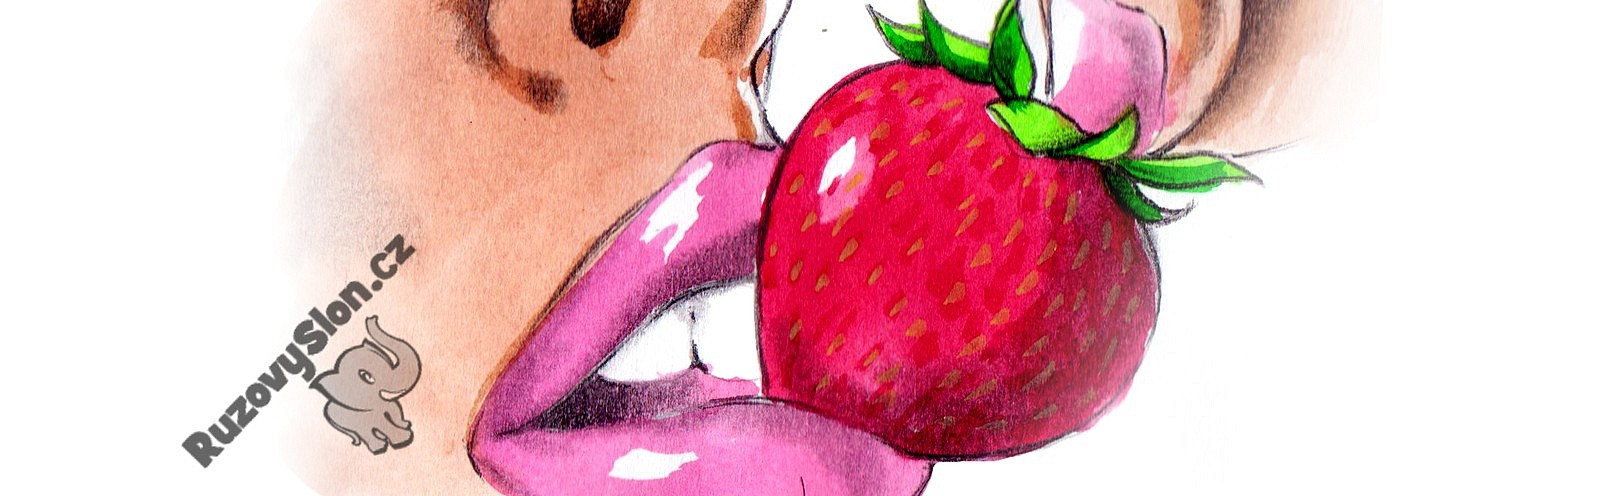 ústa s jahodou